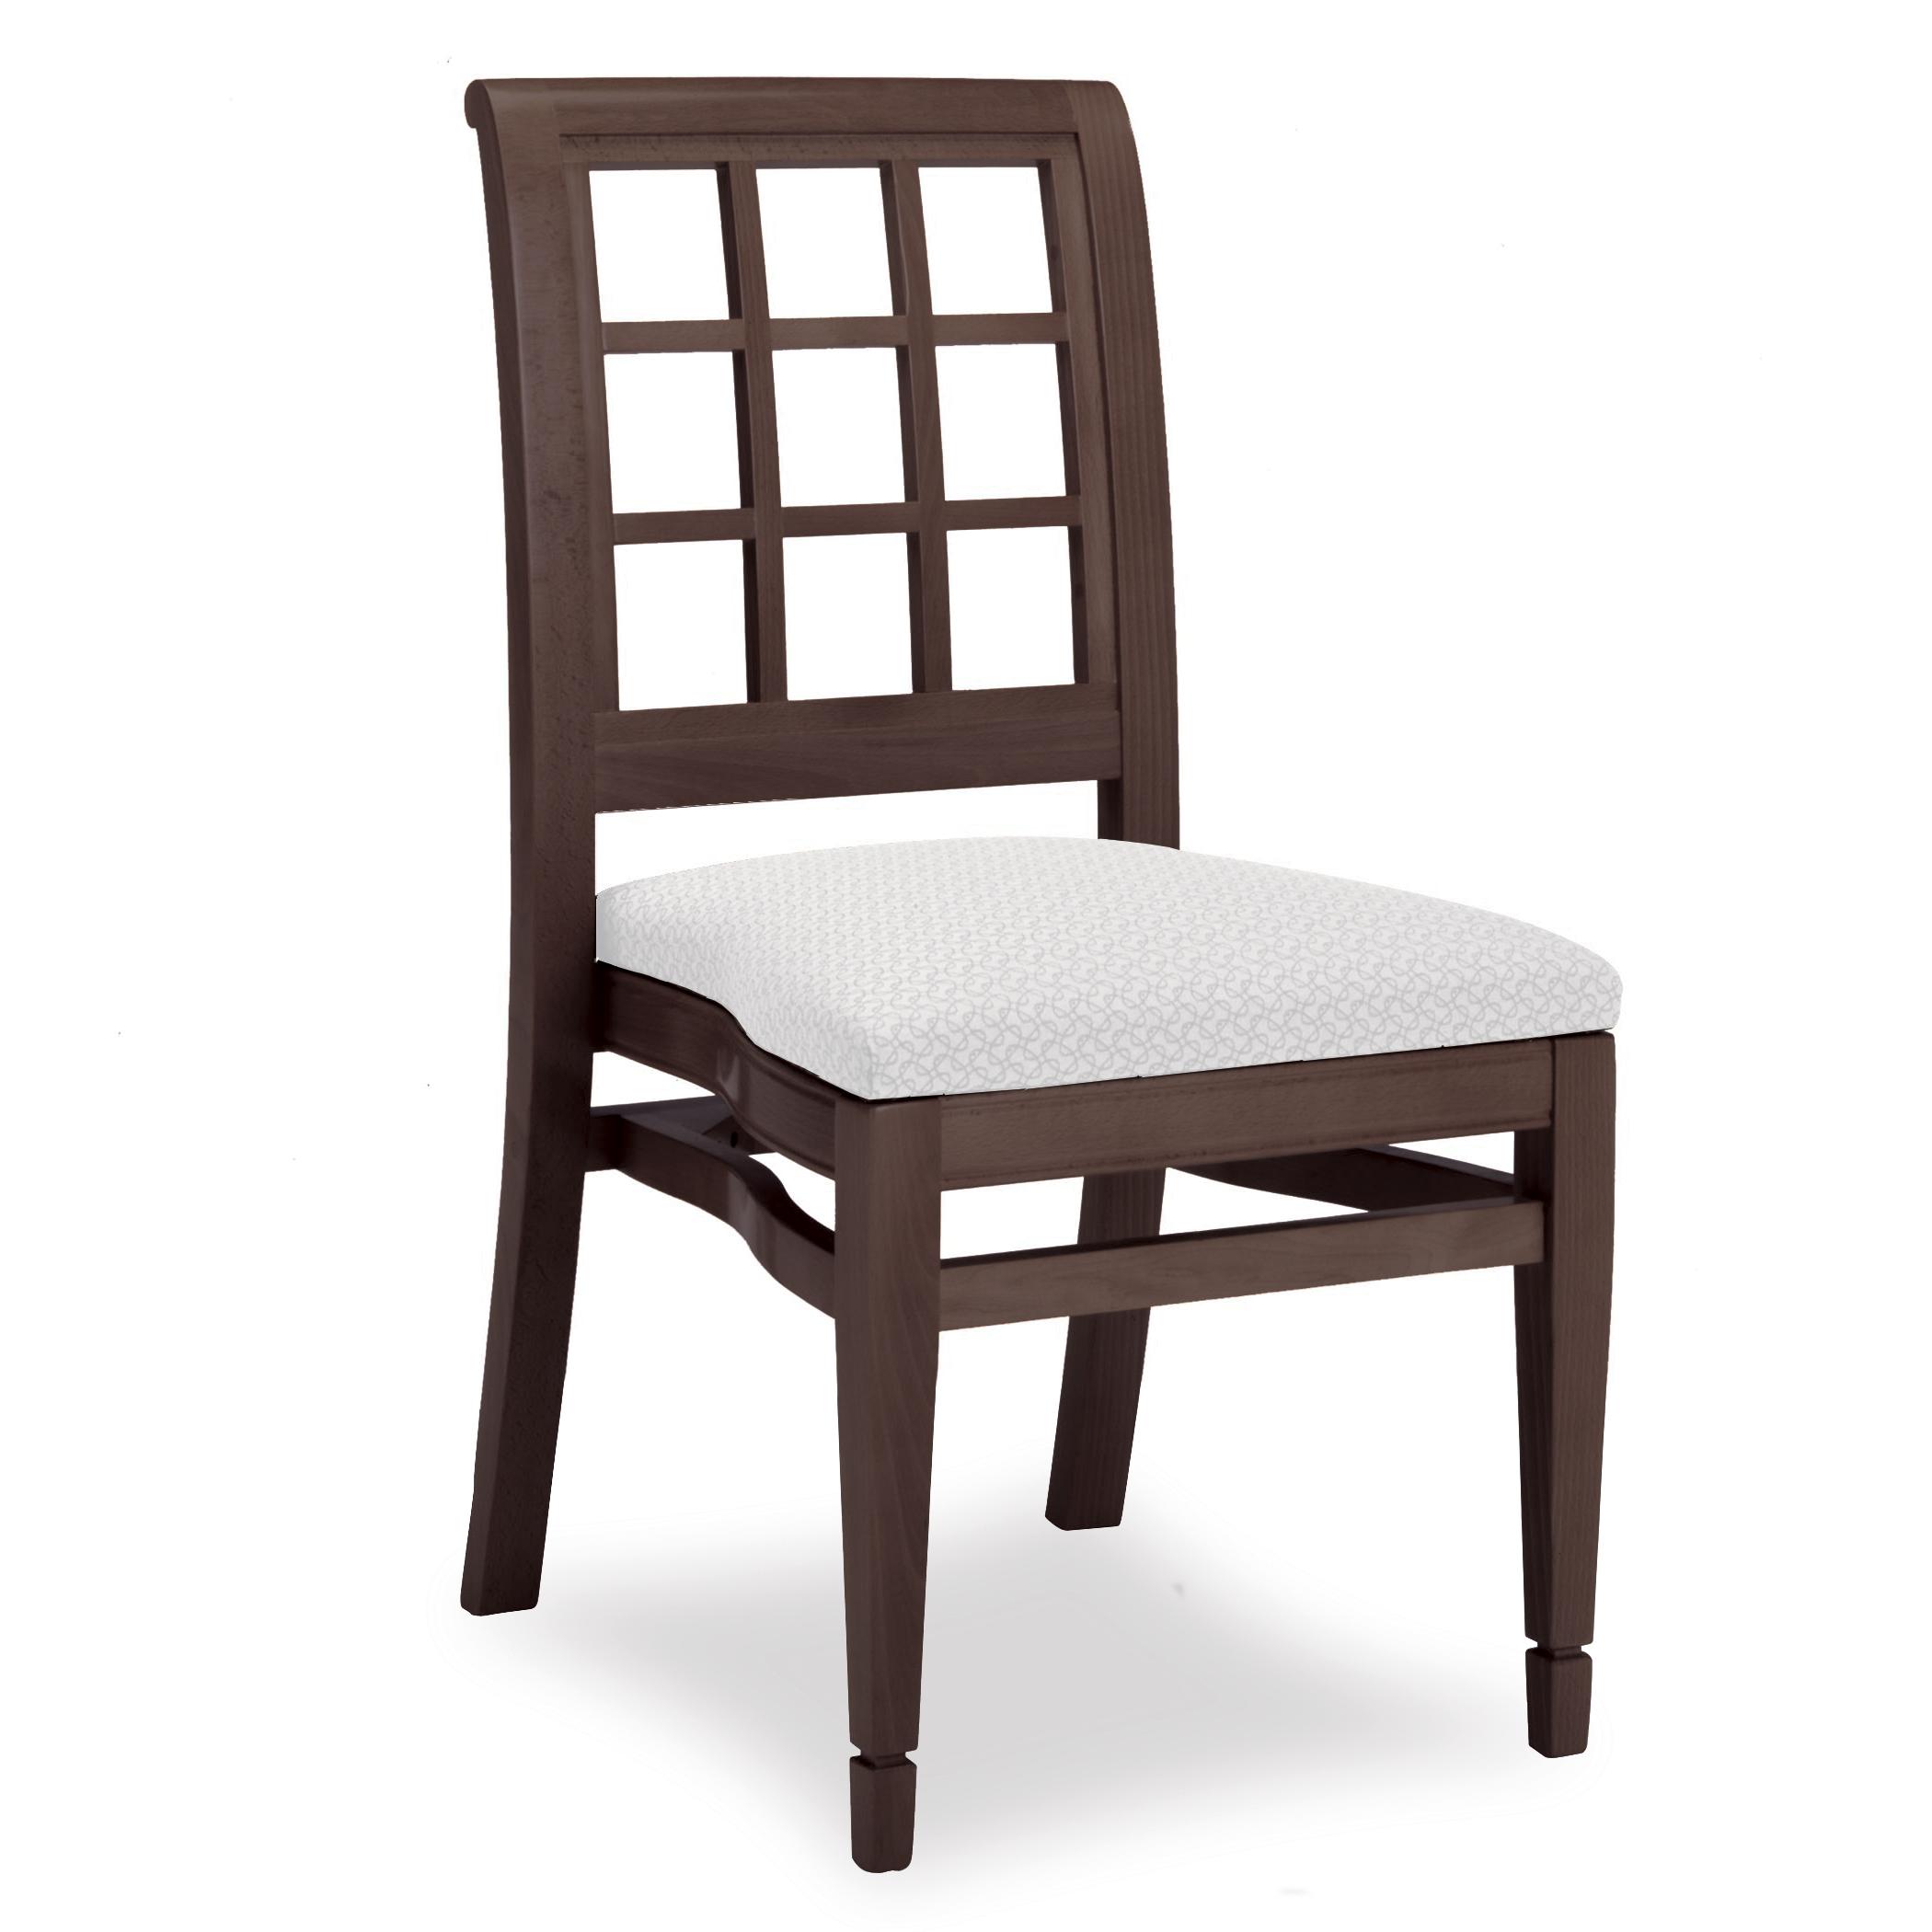 chair photo frame hd drive wheel 4026 stacking wood side